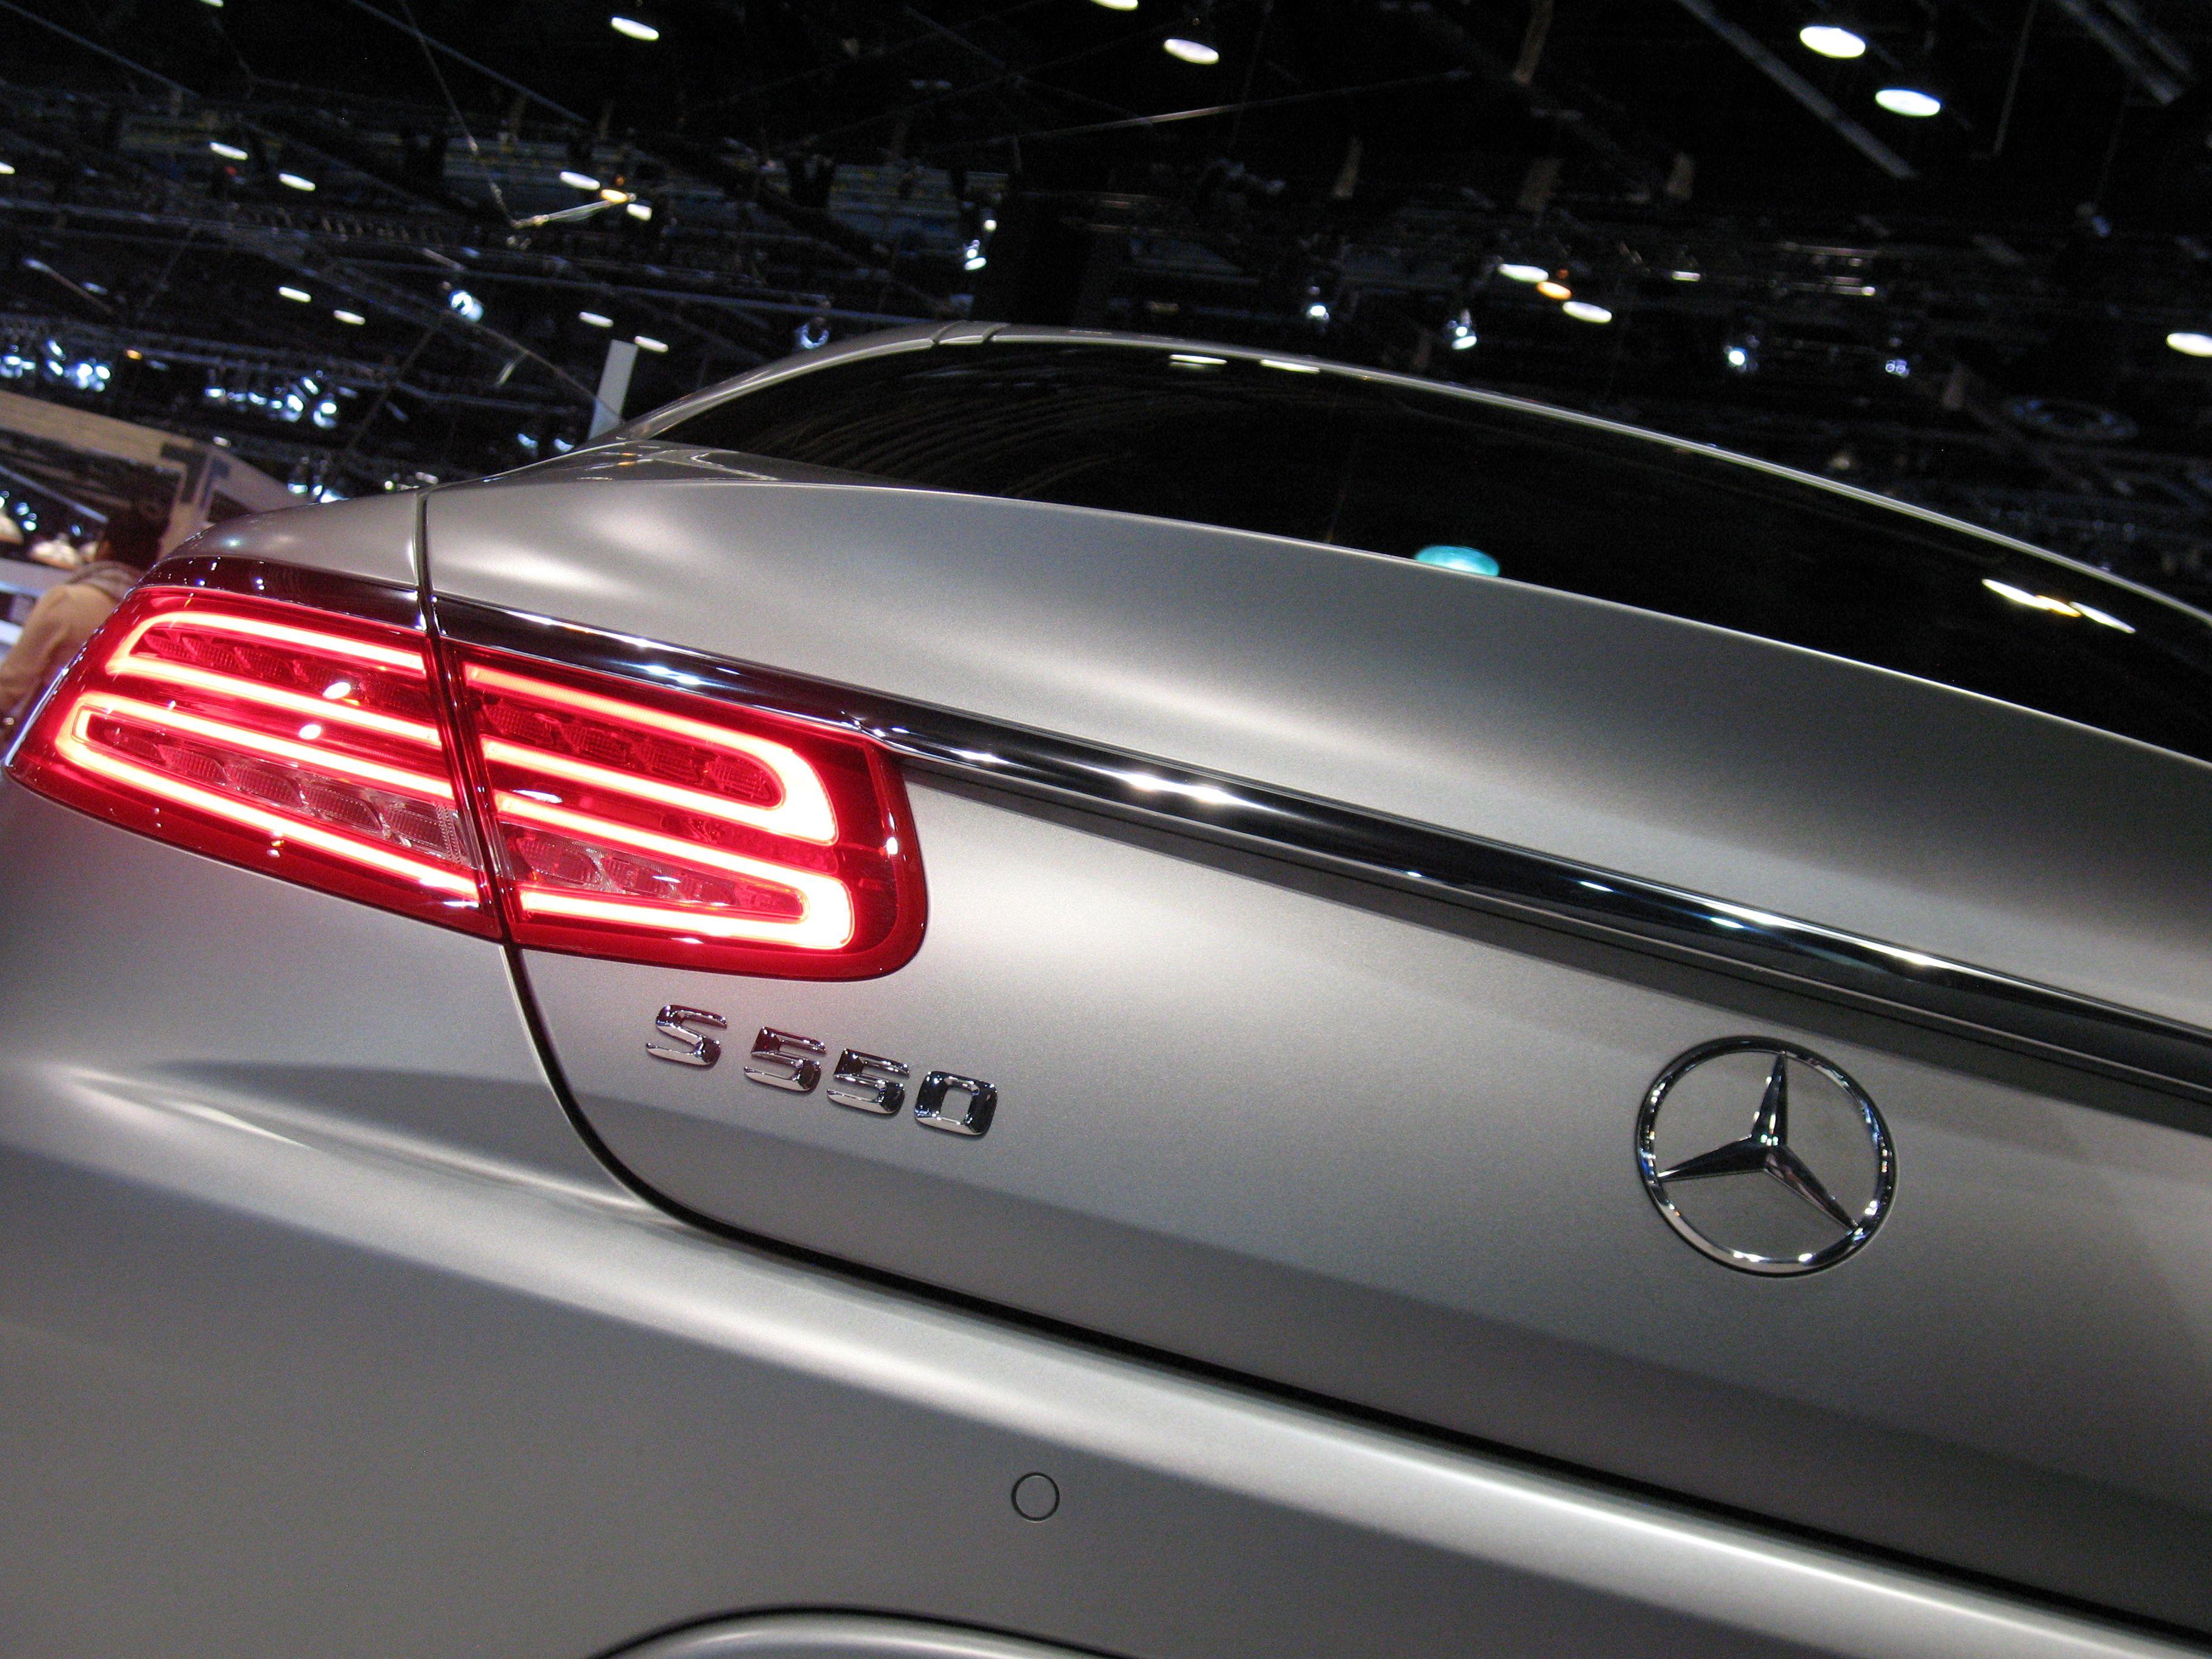 2016 Mercedes Benz S550 Coupe Rear Benz S550 Mercedes Benz S550 Mercedes Benz S550 Coupe